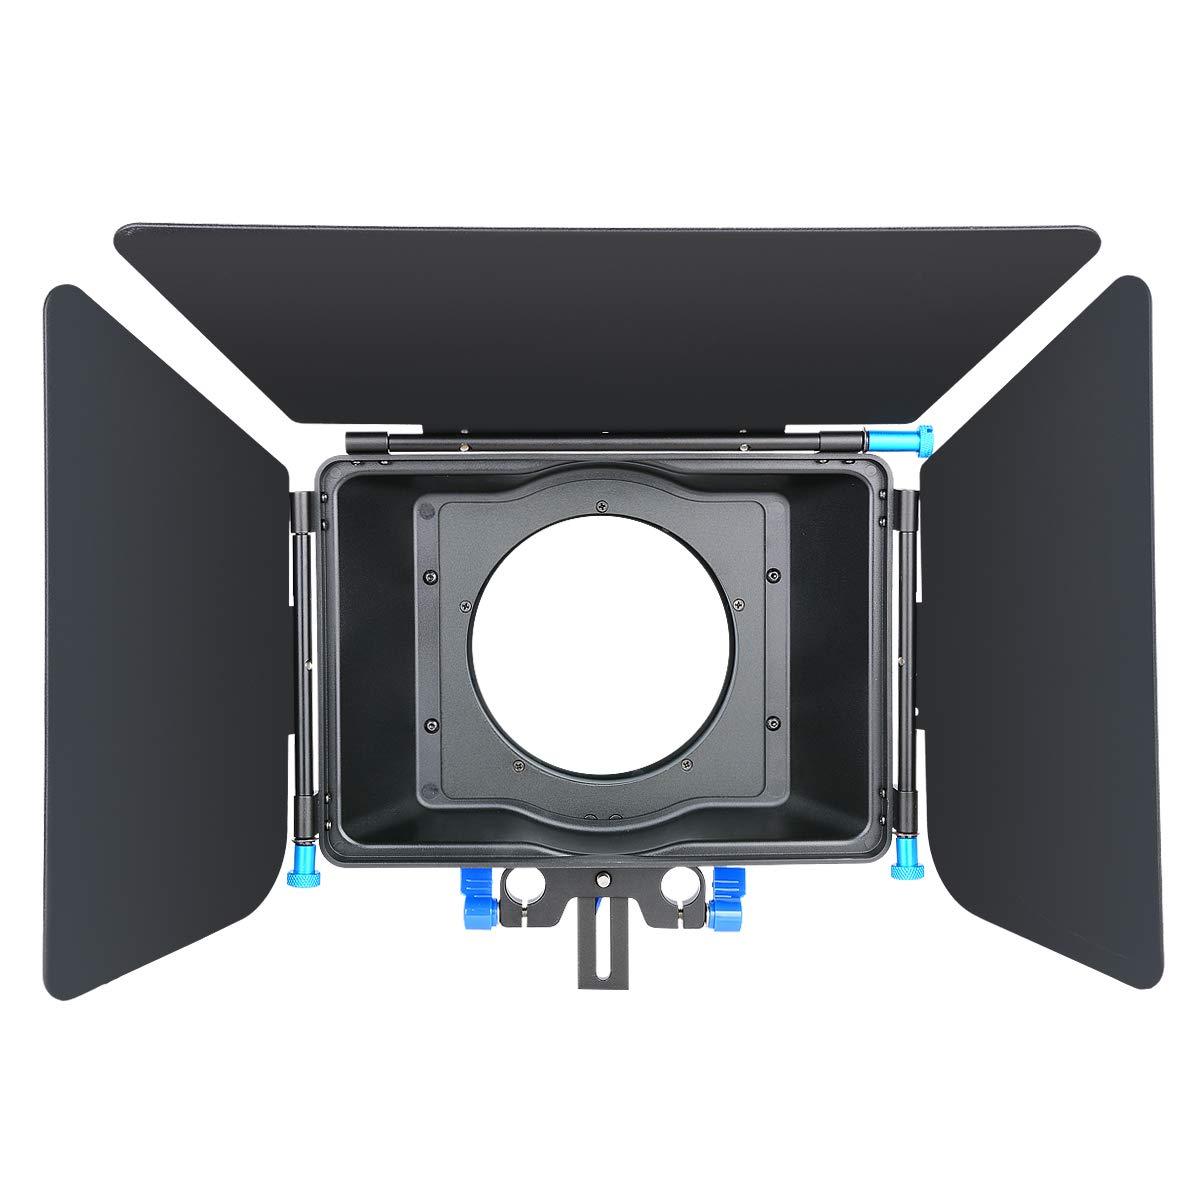 CINEPIECE Pro DSLR Digital Matte Box Sunshade for Follow Focus System 15mm Rail Rod Rig,Movie Kit Film Making System,Video,DSLR Camera Cages, Nikon, Canon,Sony,Camcorder, DVR, DV, Recorder